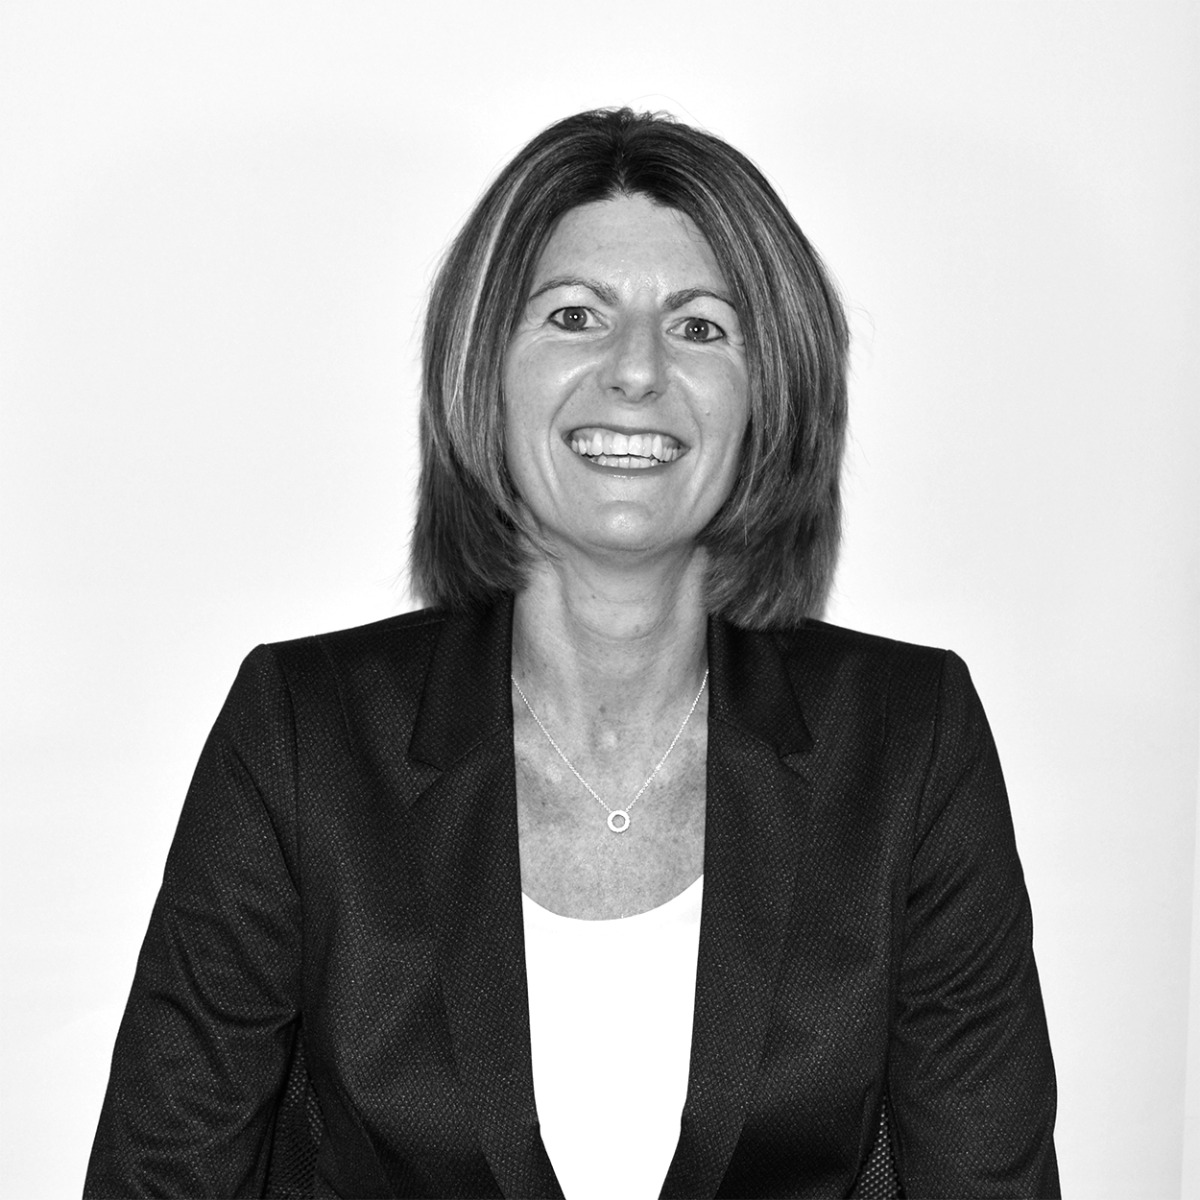 Lisa Forde